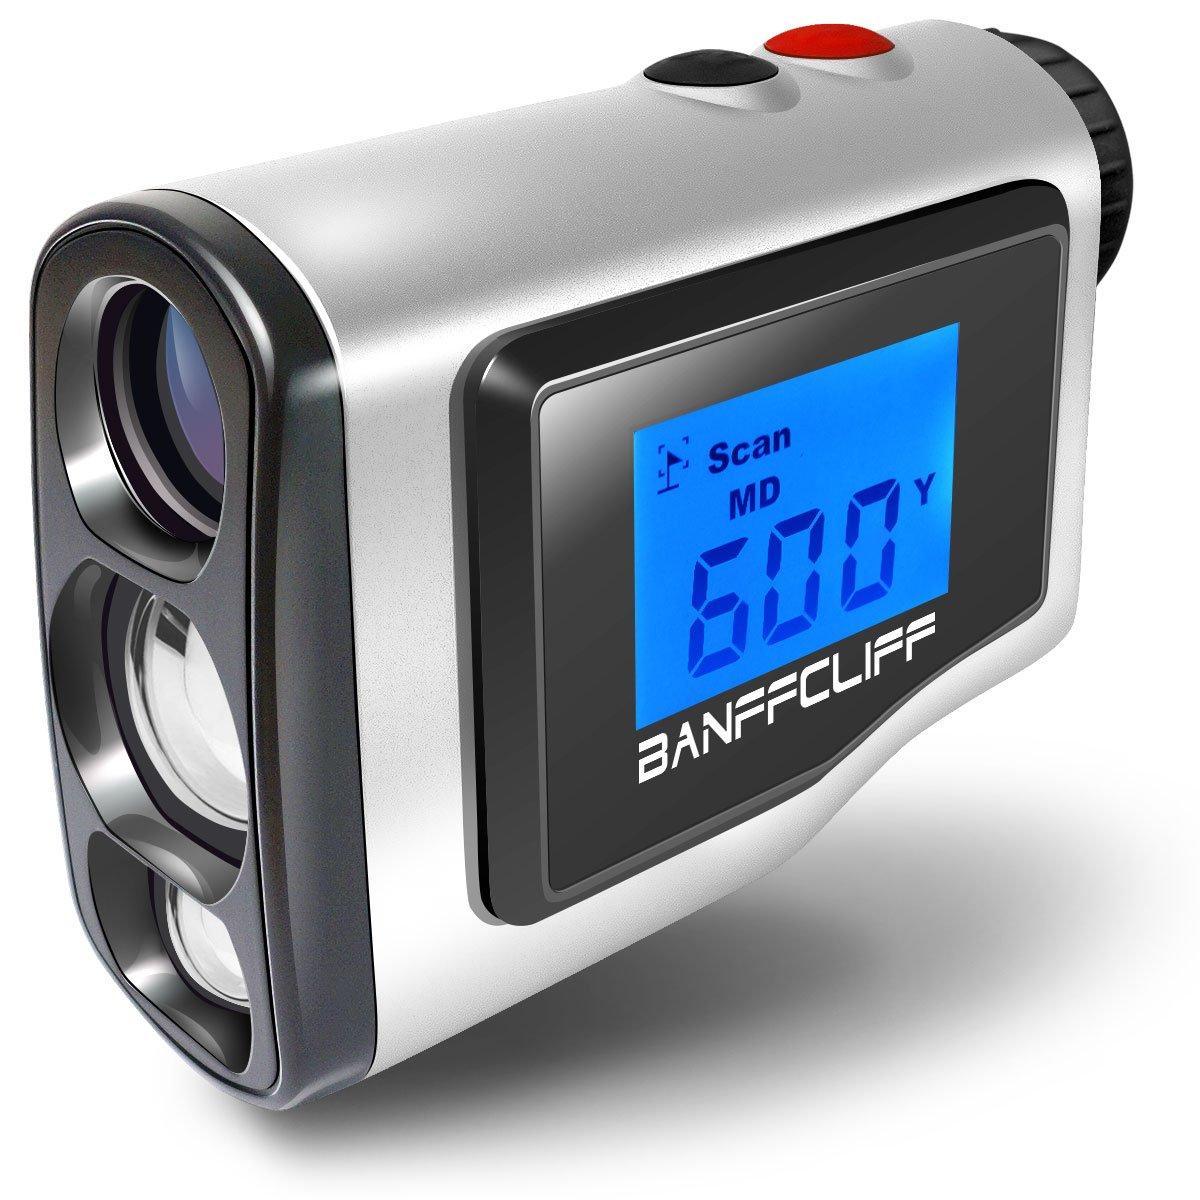 BanffCliff 1.8'' LCD Screen Display Golf Rangefinder, 656Yard/ 600M Laser Range Finder with Golf Flagpole Lock Fog Mode Distance Correction Water Resistant Laser Distance Measure w/ Carry Case Battery by BanffCliff